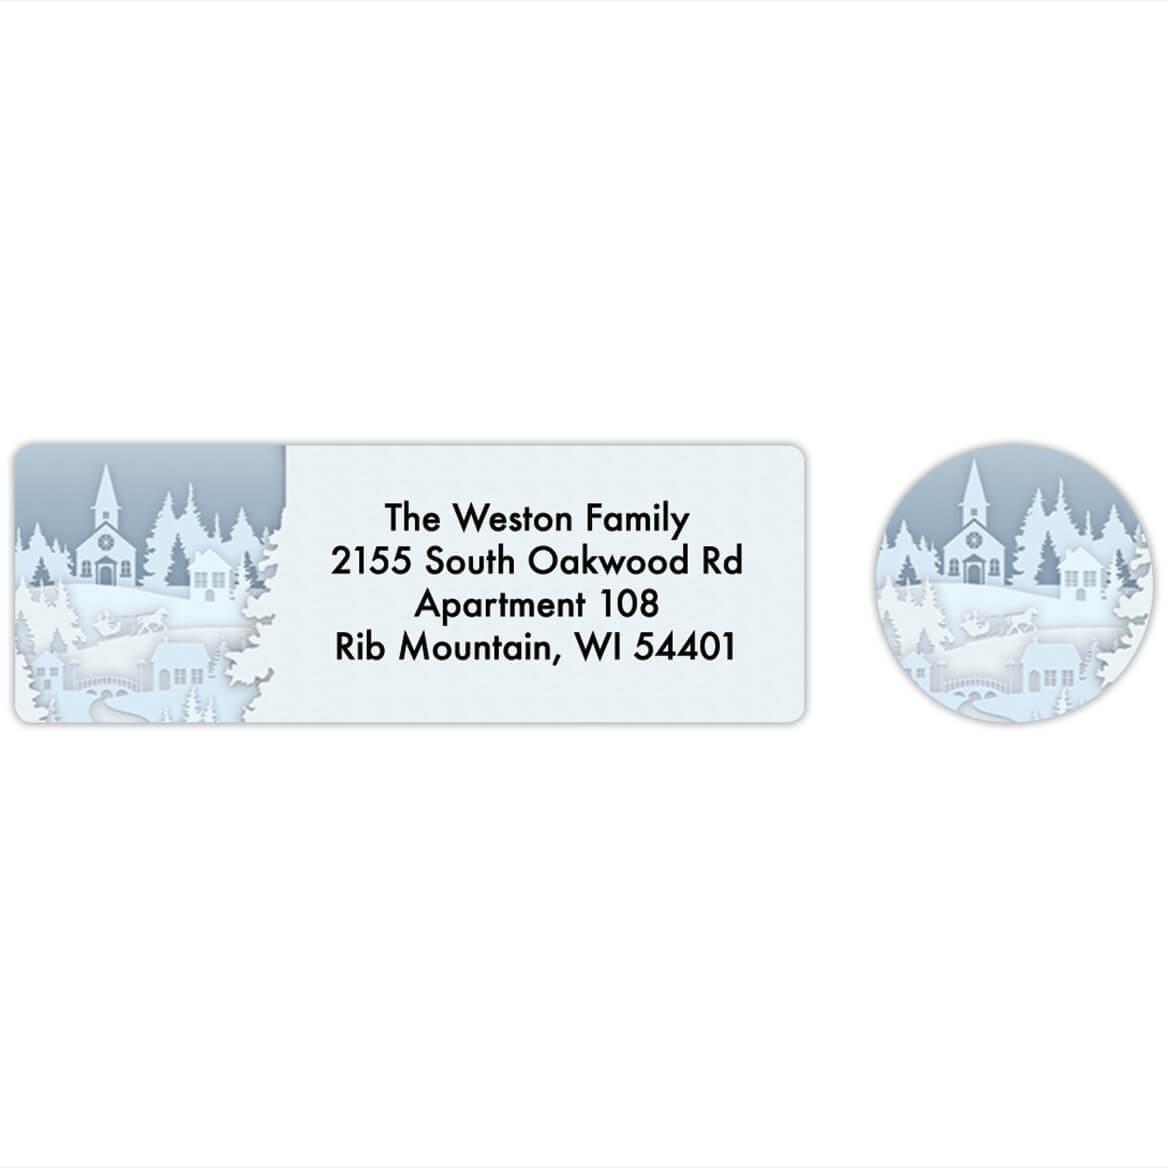 Papercut Collage Labels & Seals Set of 20-368282